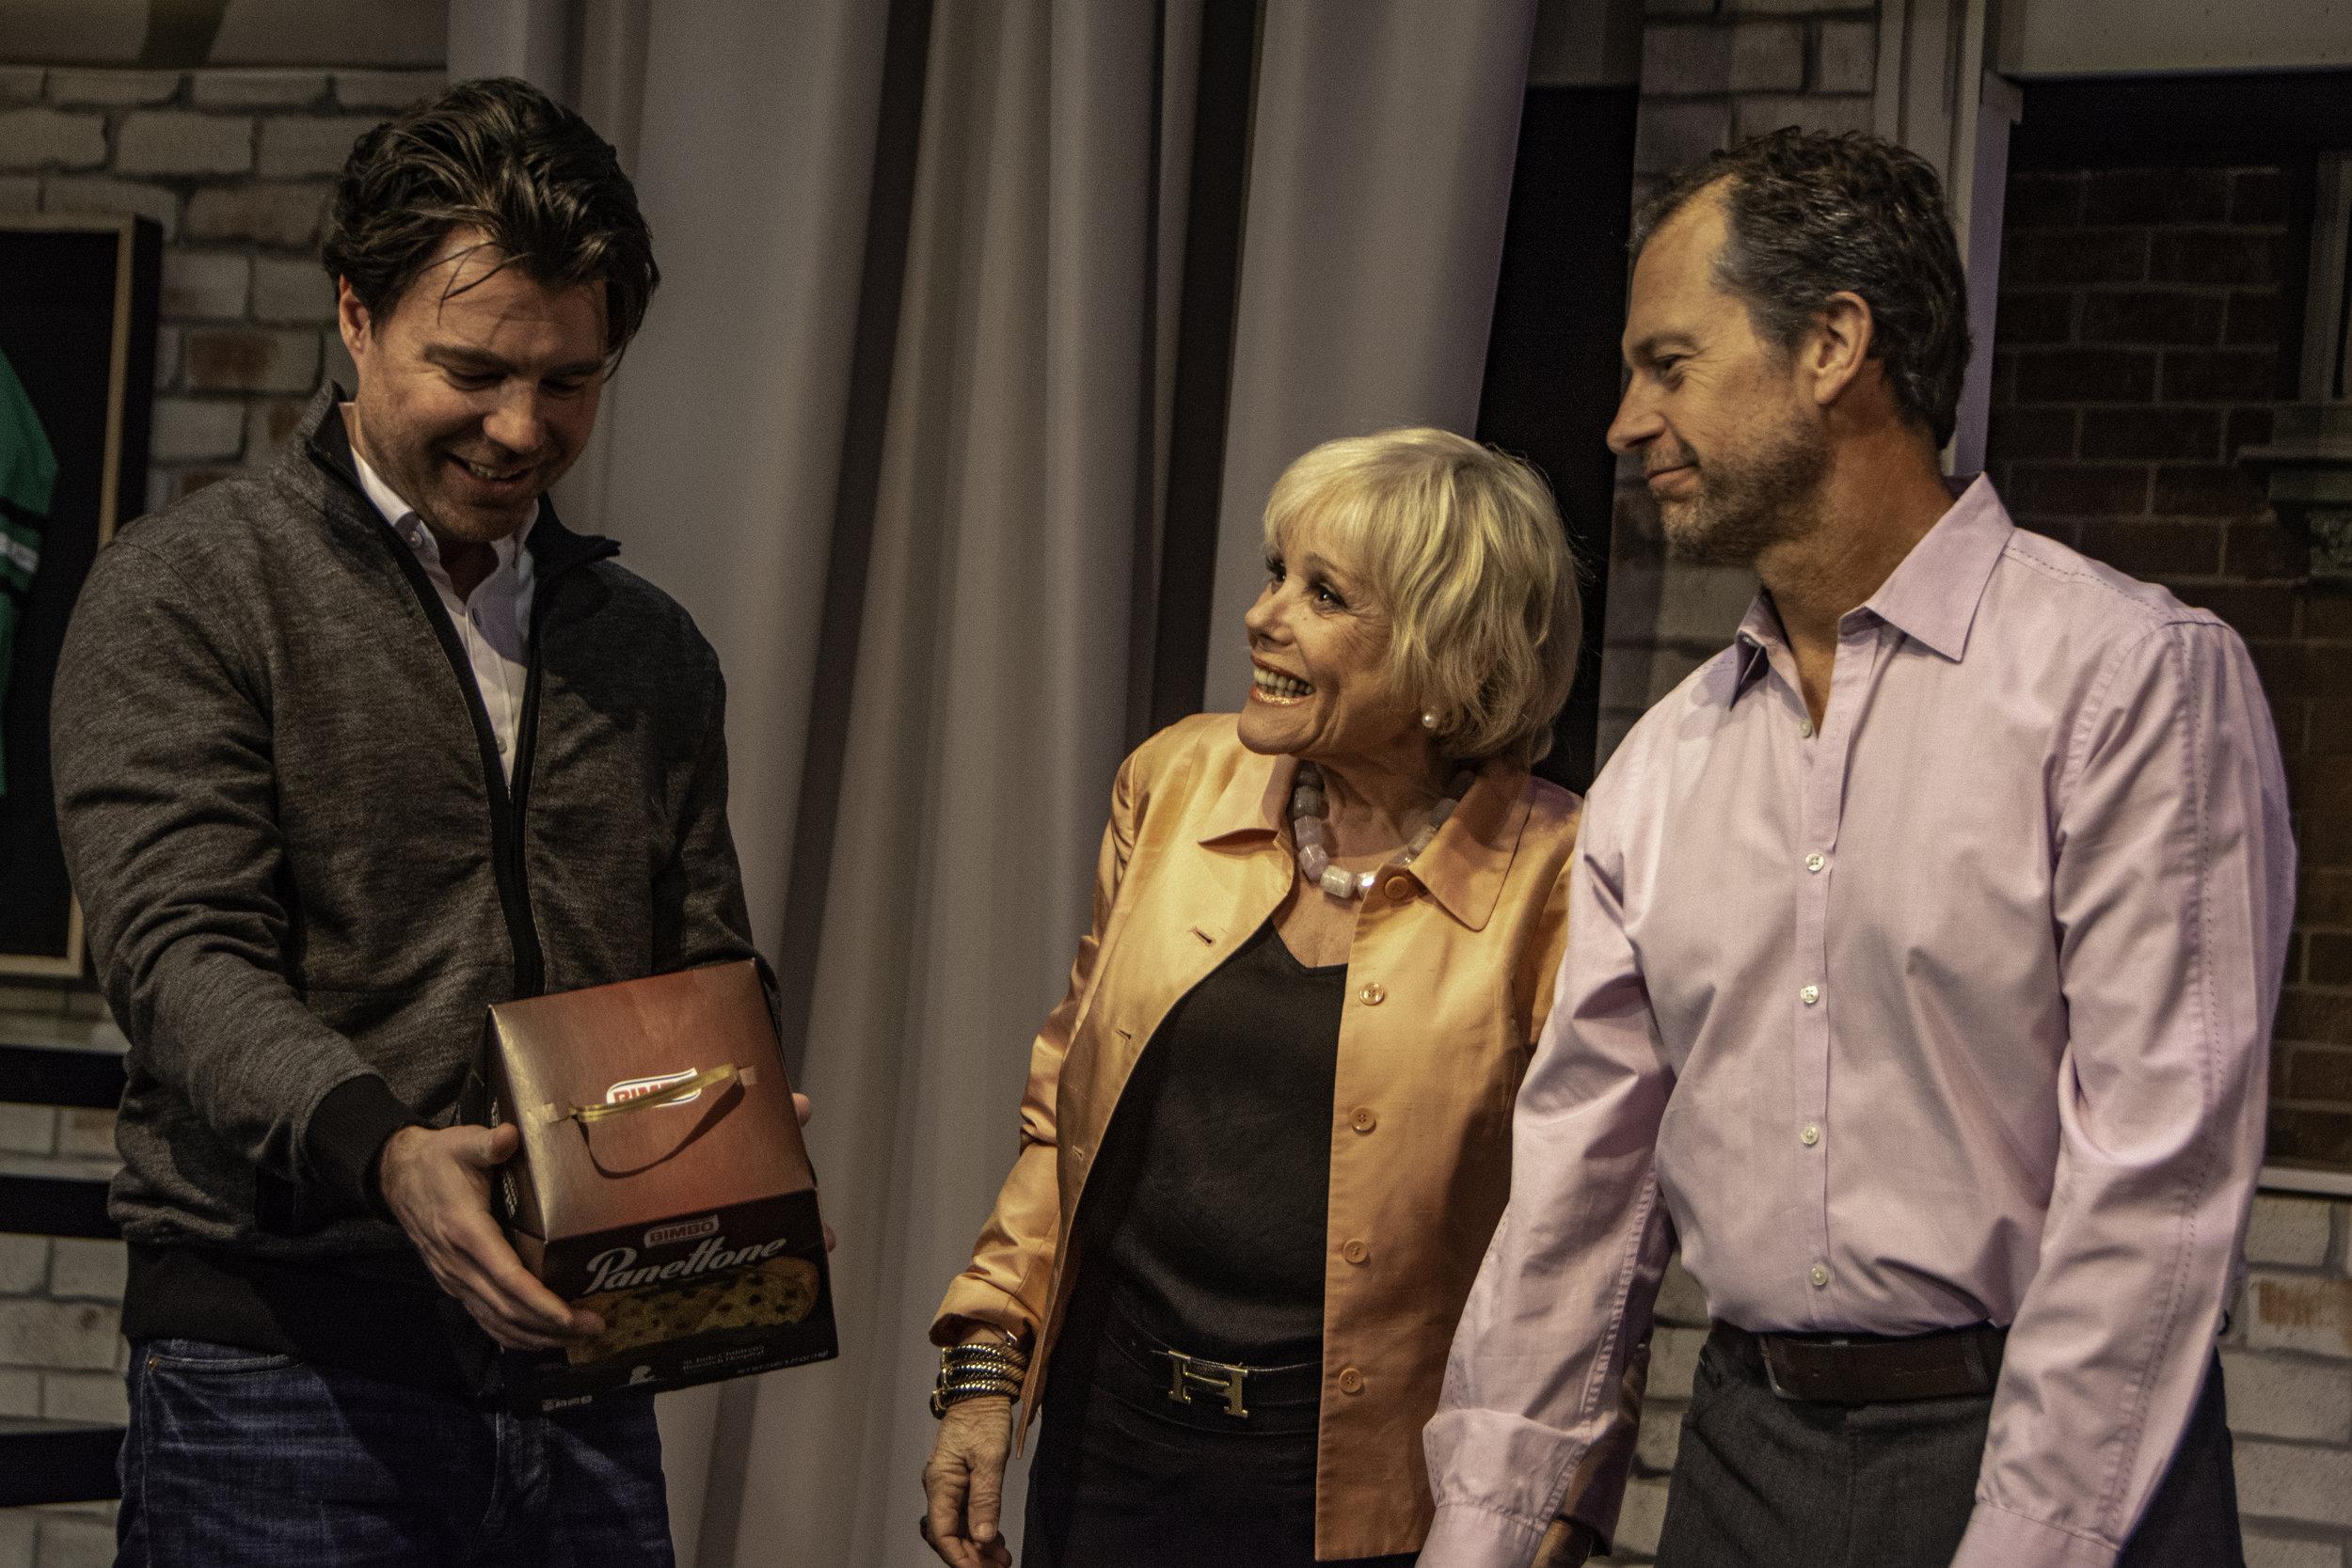 Beau Jackett as Greg, Lynda Sturner as Maxie and Tony Travostino as Peter. Photo by Alan Trugman.